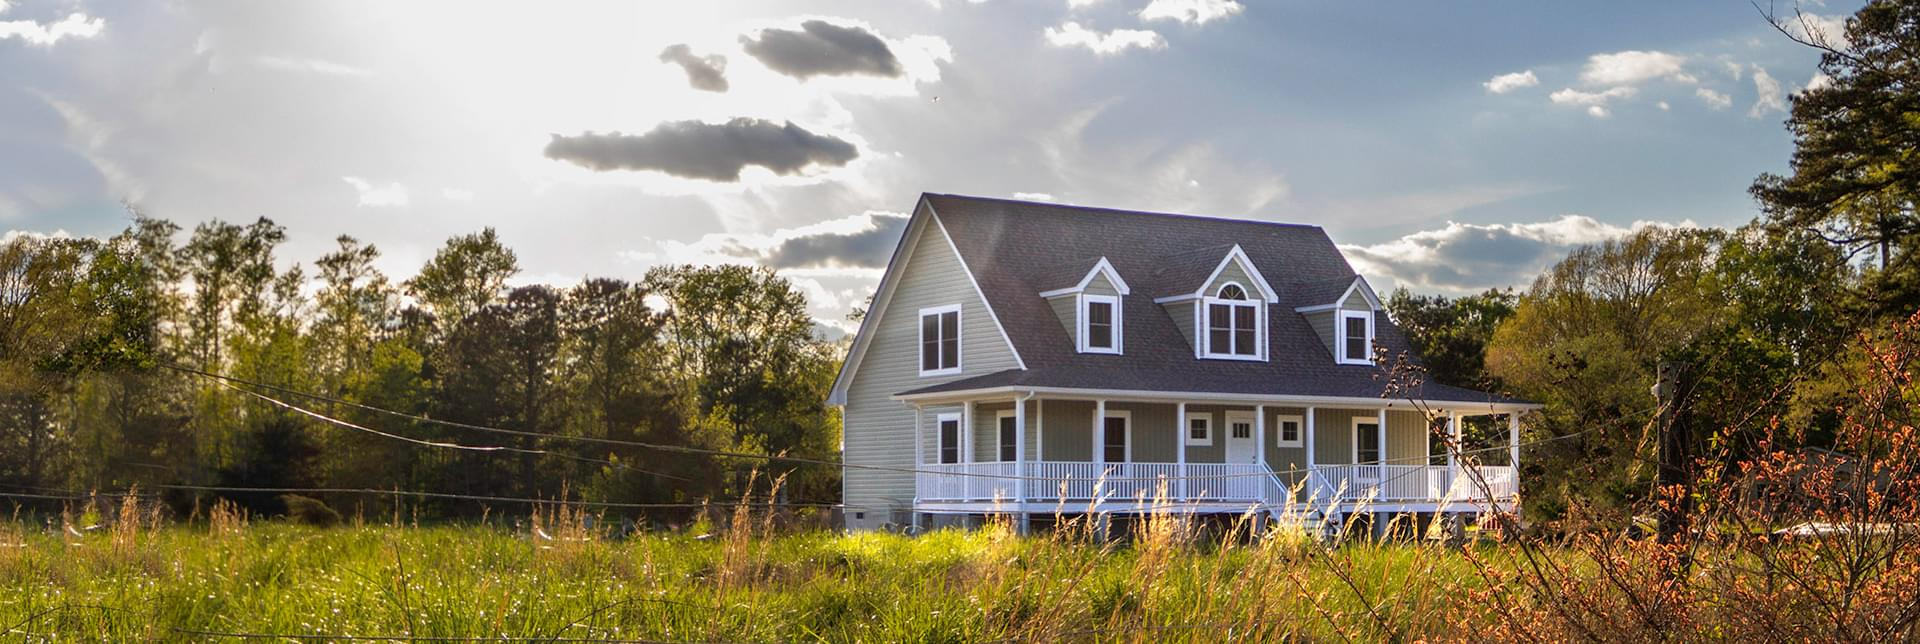 New Homes in Staunton VA